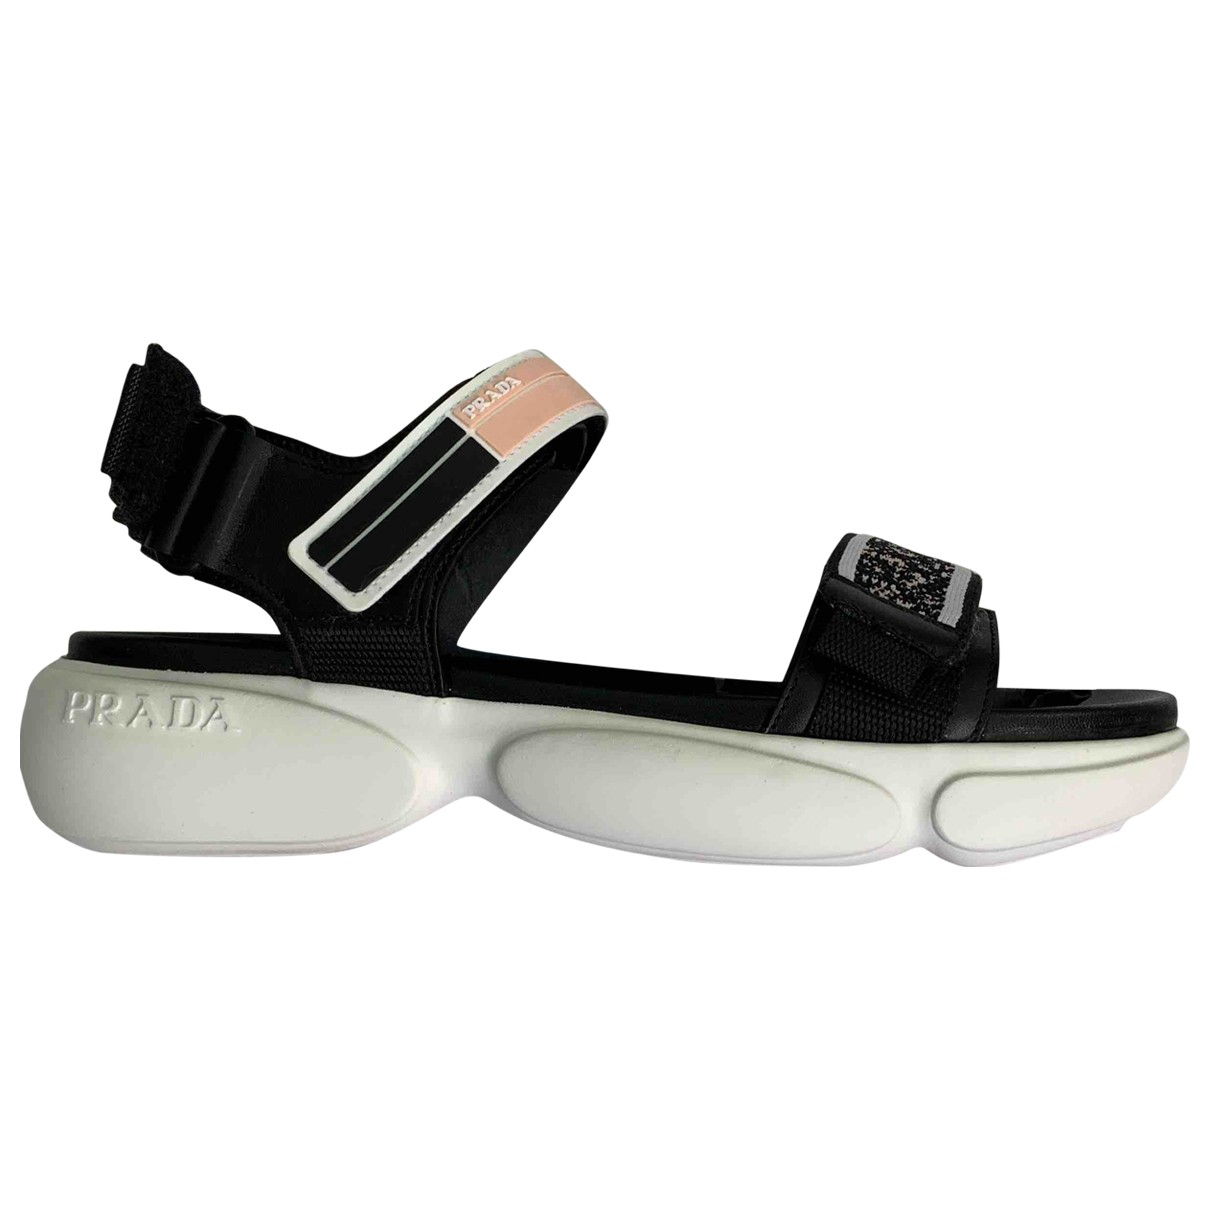 Prada N Black Rubber Sandals for Women 38 EU